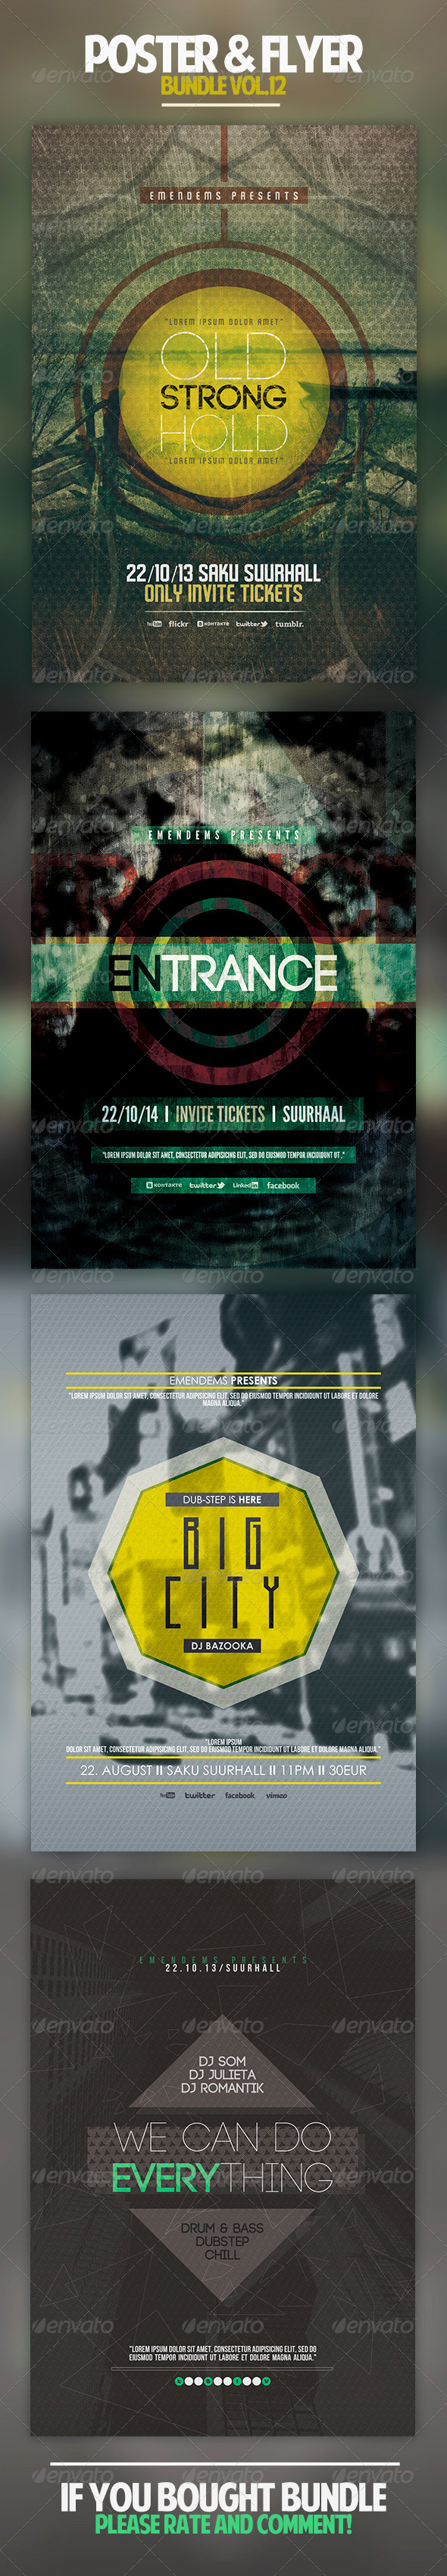 Poster & Flyer Bundle Vol.12 - Concerts Events